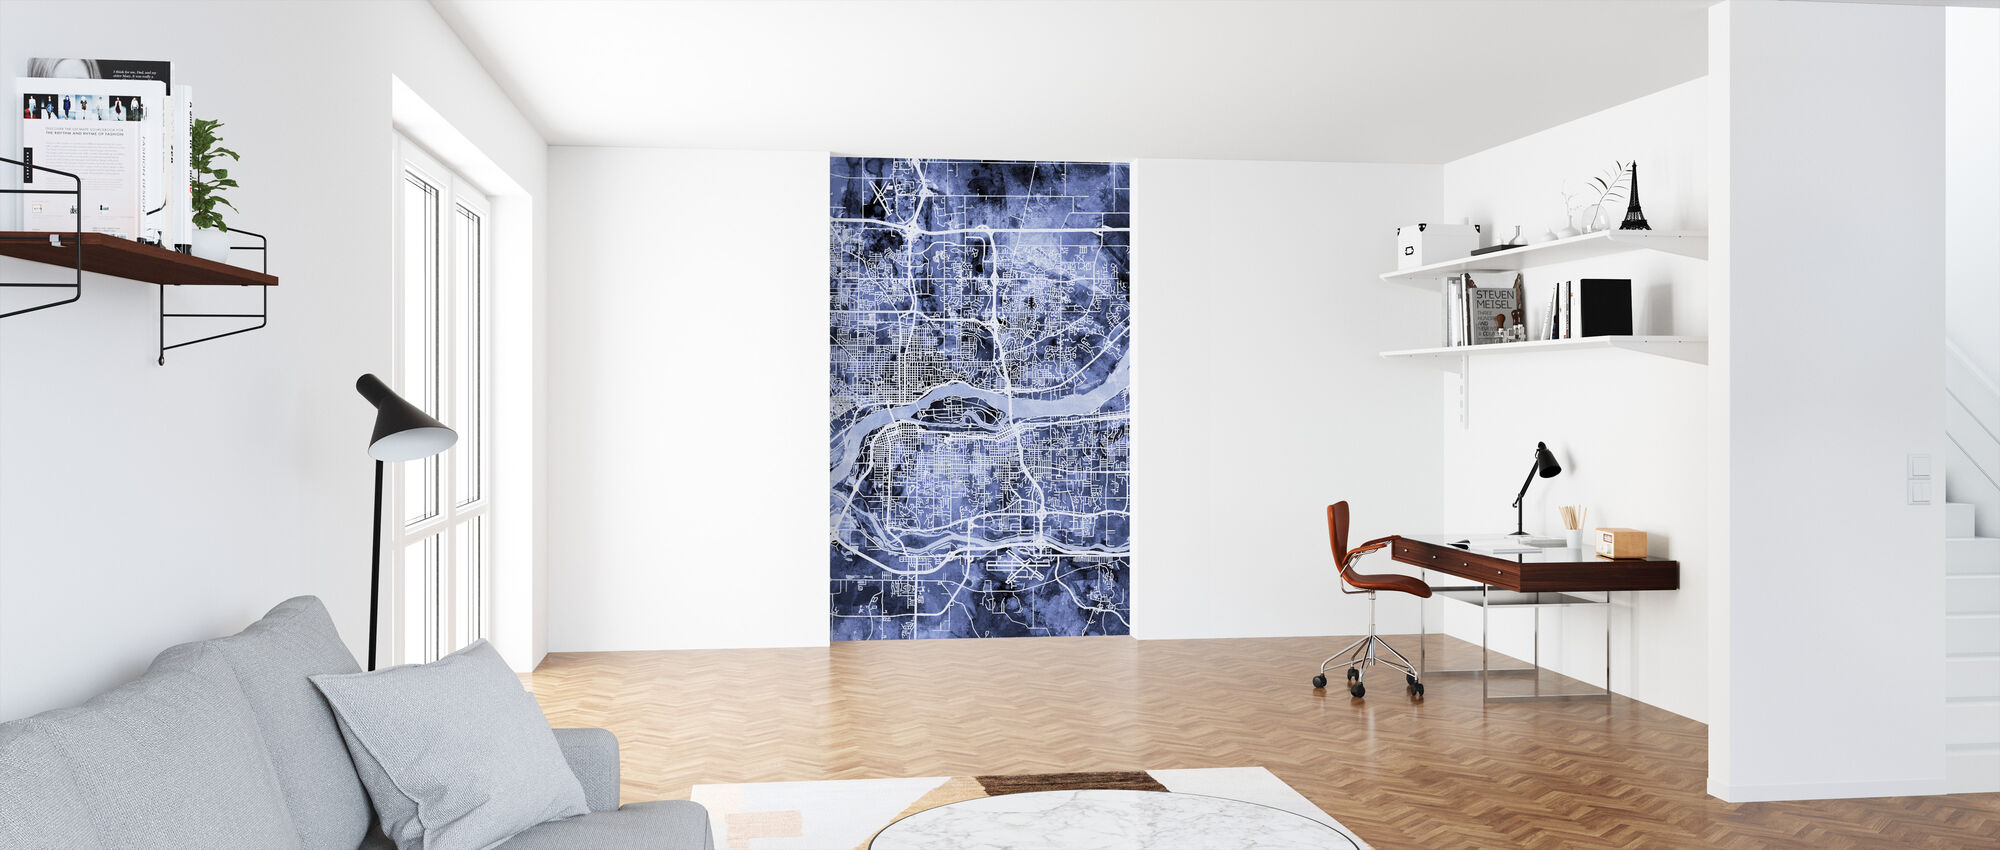 Quad Cities Street Karta - Tapet - Kontor